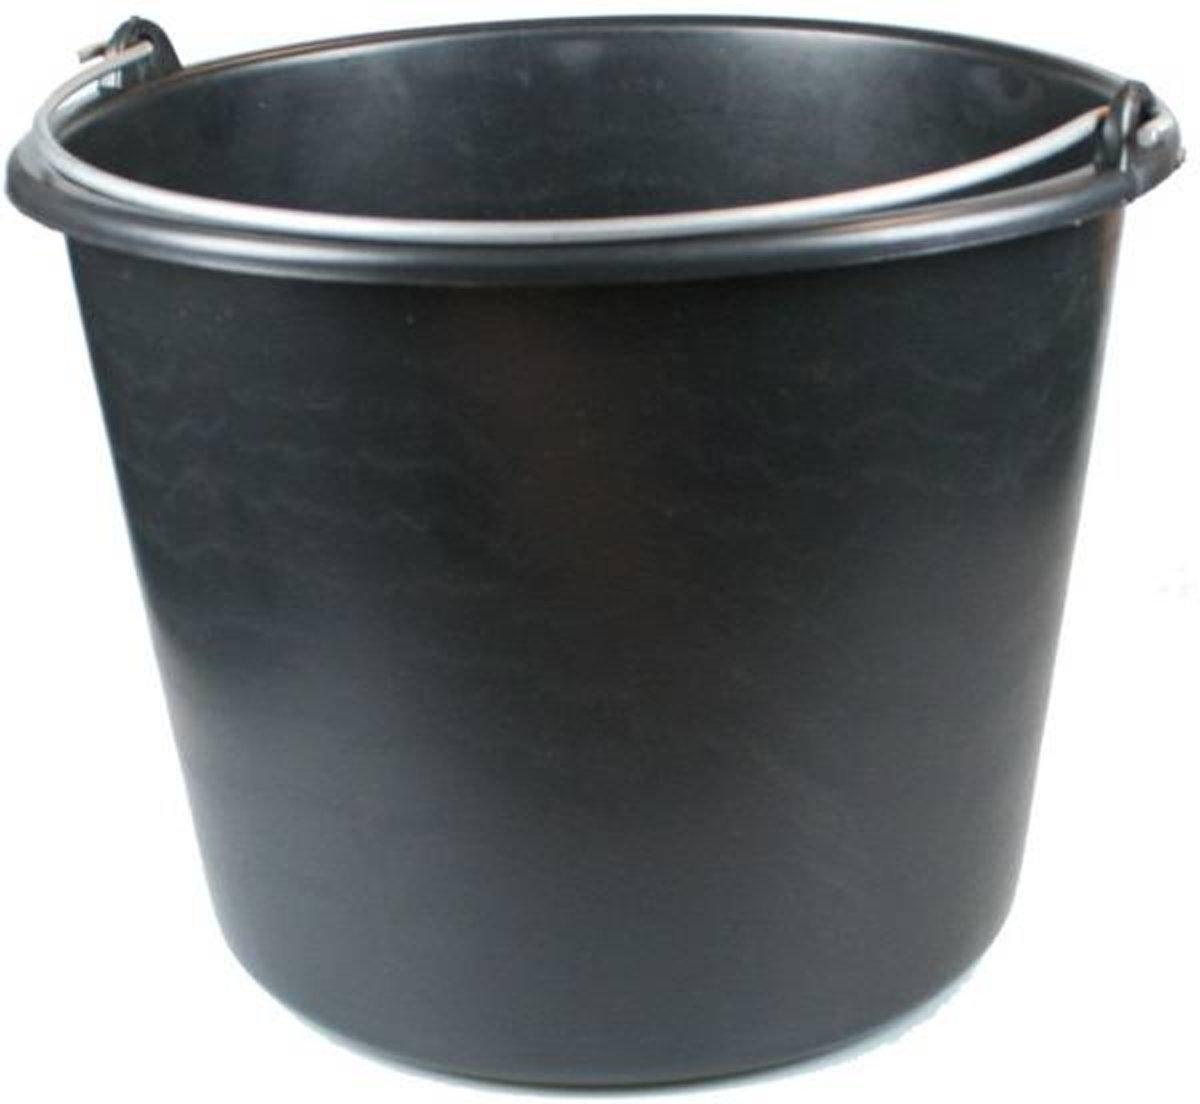 ES Bouwemmer 12 Liter Zwart kopen